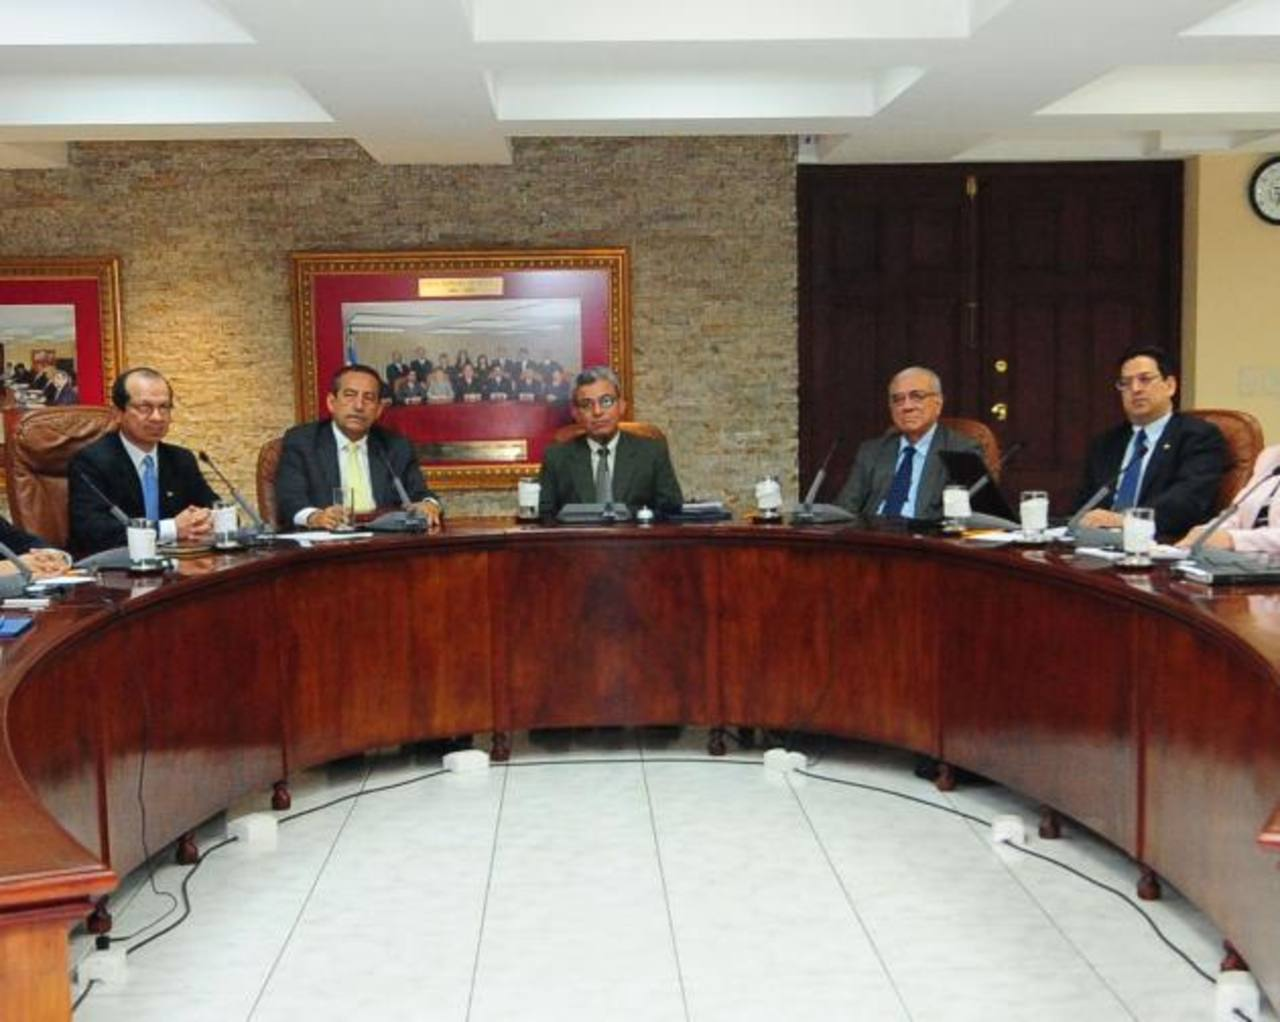 Sala Constitucional: magistrados Sidney Blanco, Florentín Meléndez, Salomón Padilla, Belarmino Jaime y Rodolfo González.